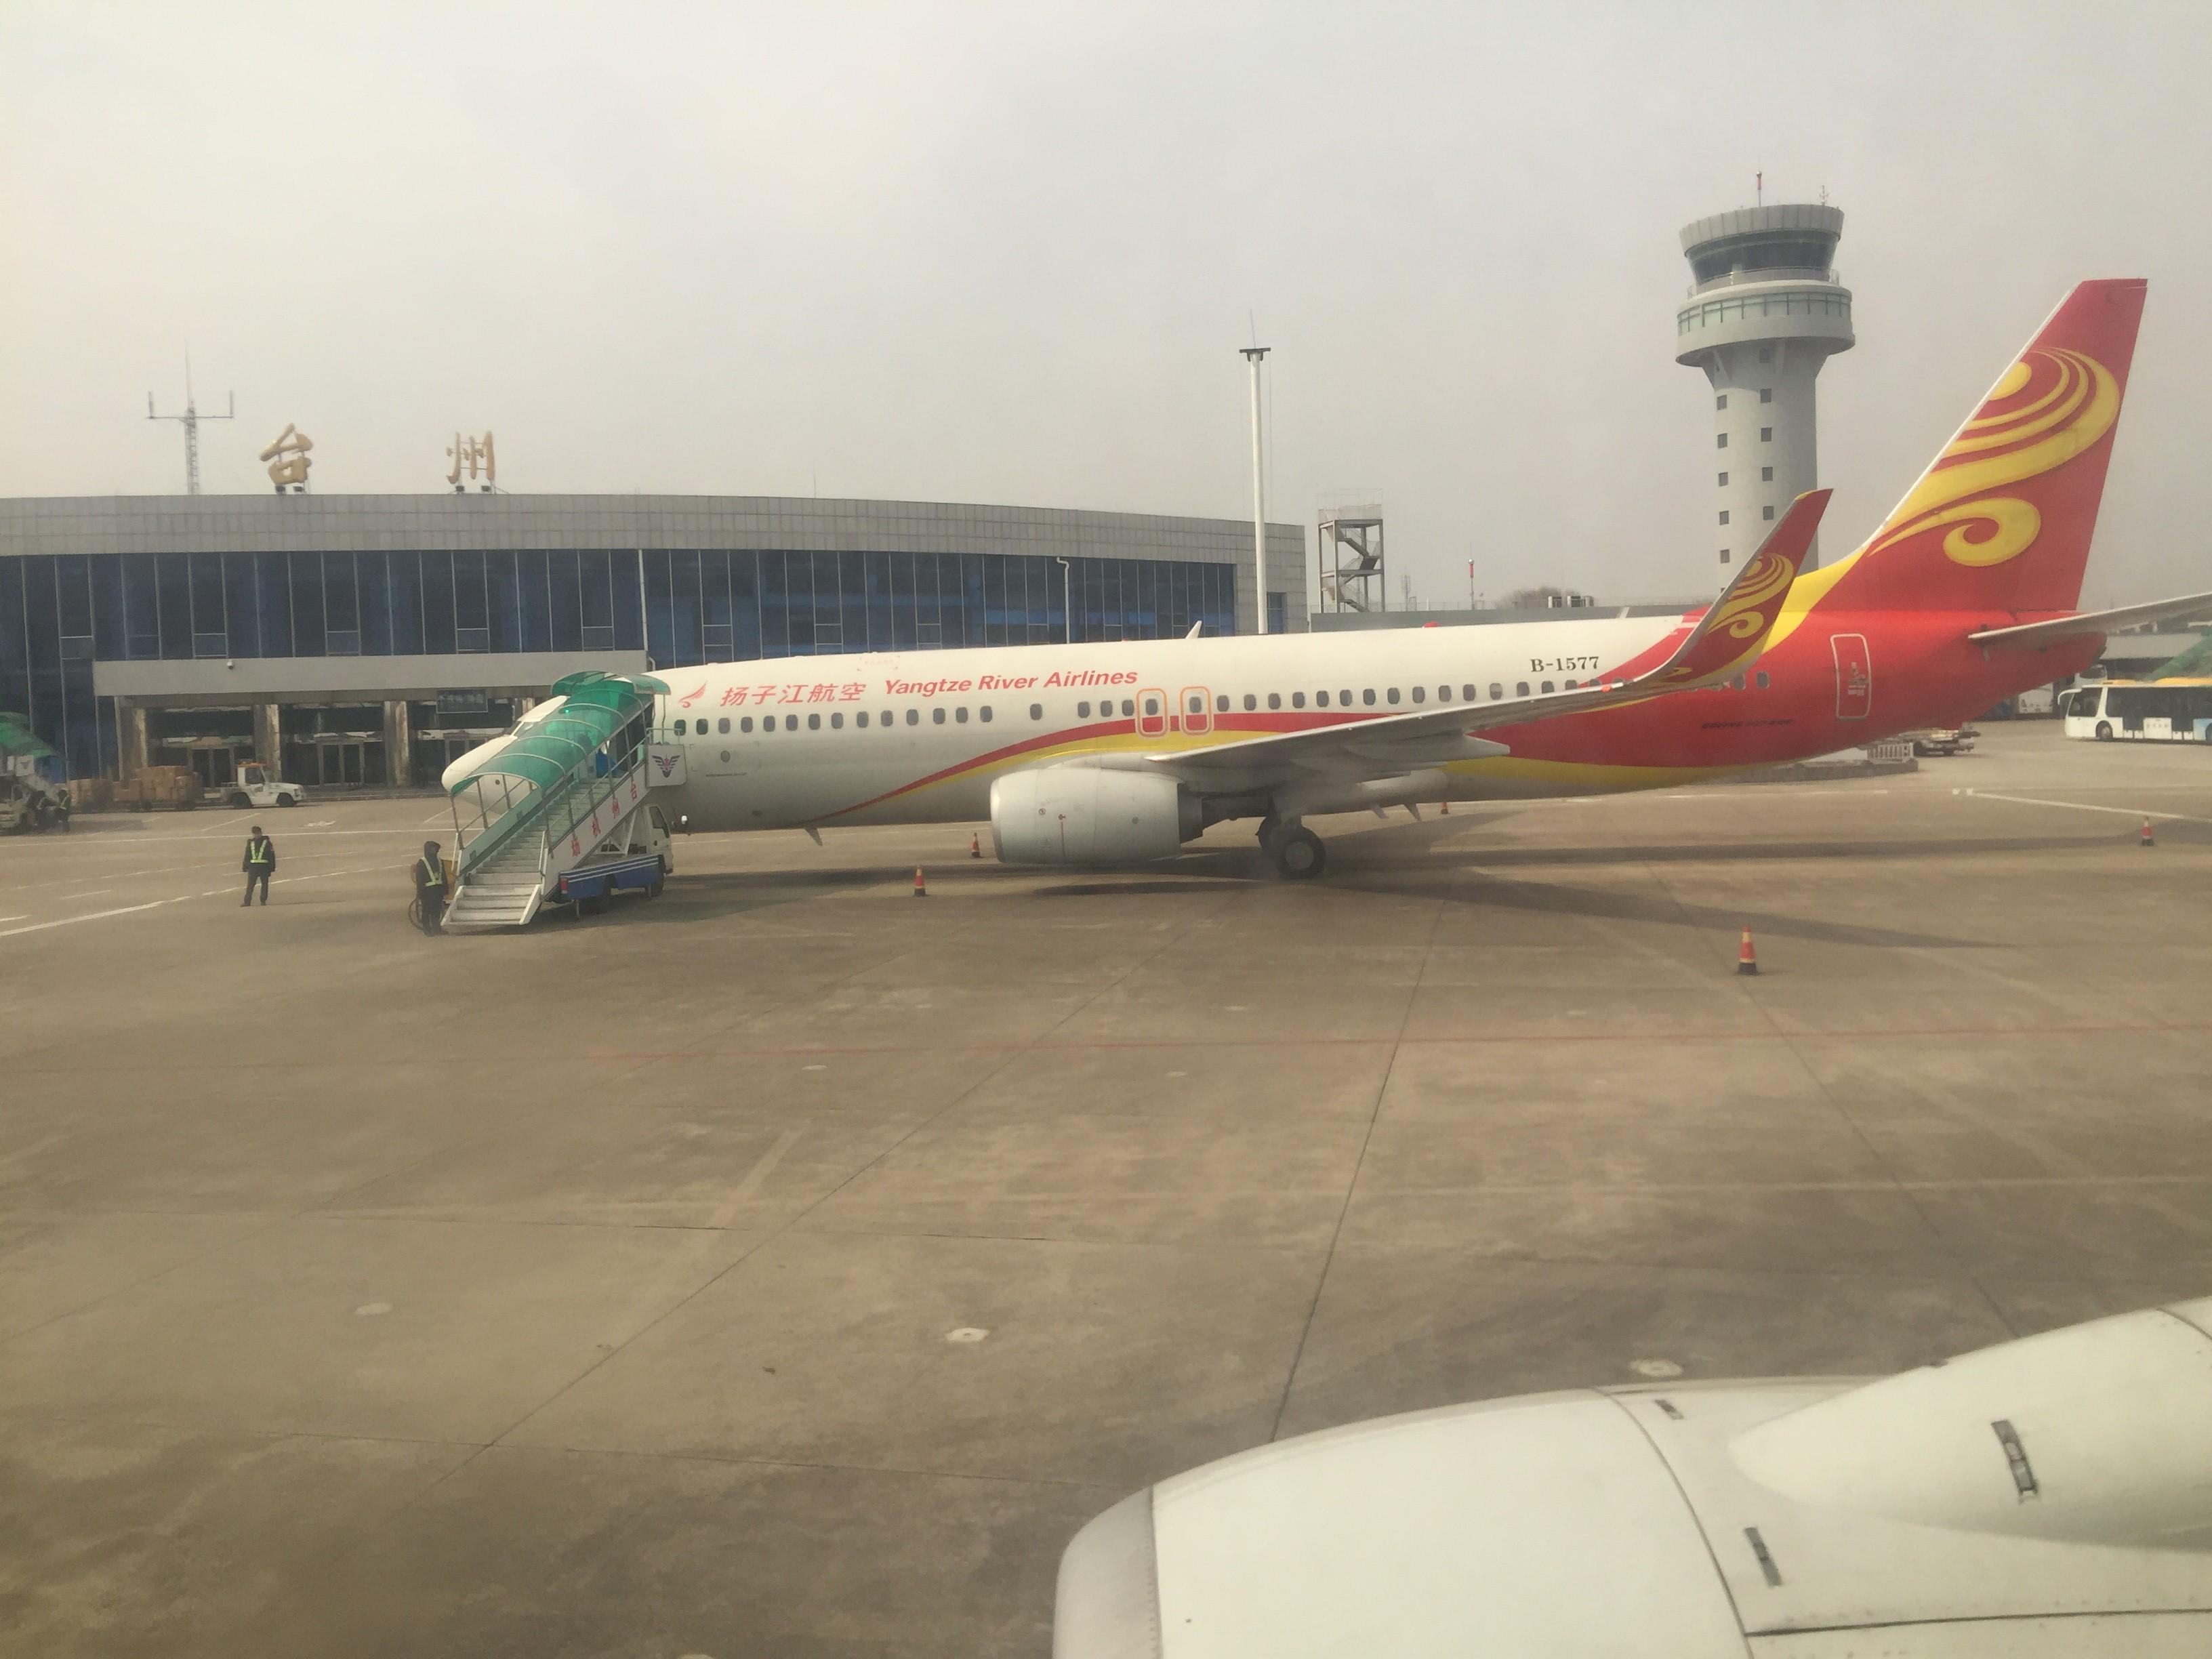 Re:[原创]「BoKer的飞行游记」新人首次发帖 中国东方航空 广州-台州 BOEING 737-800 B-1577 中国台州路桥机场